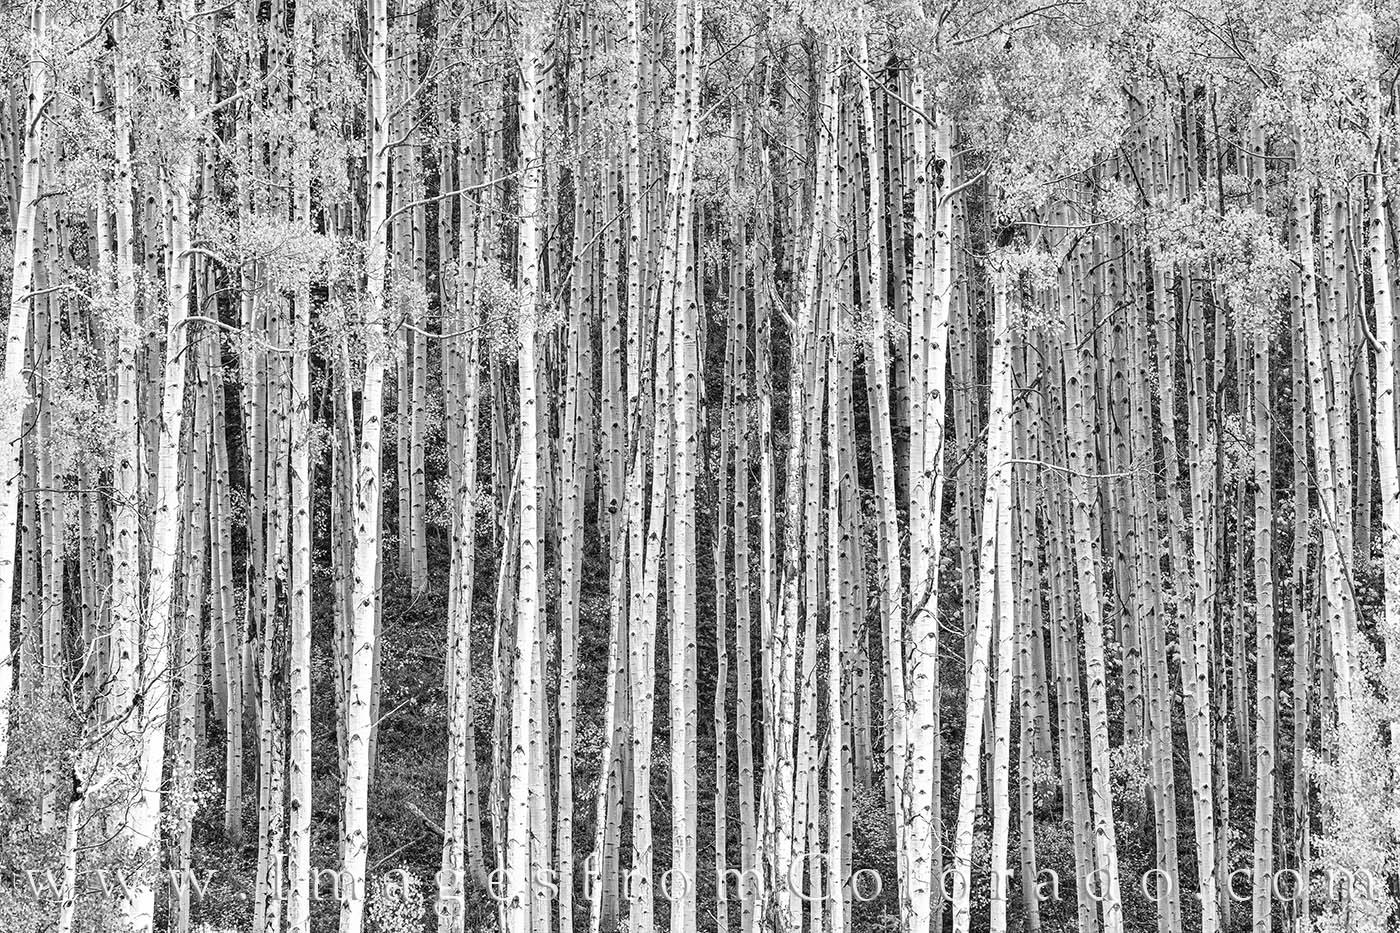 aspen, black and white, autumn, trees, leaves, photo